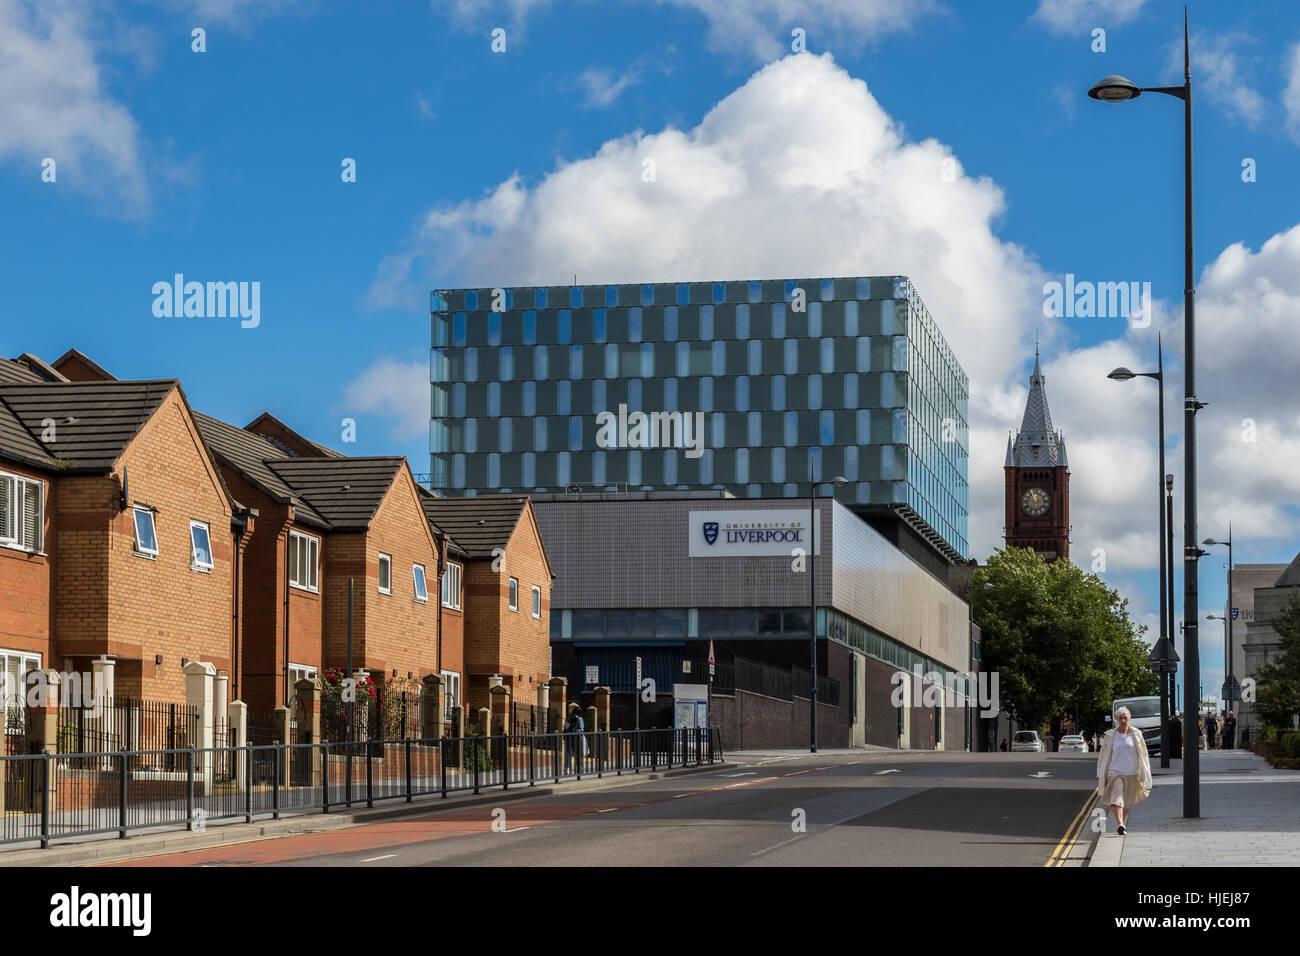 University of Liverpool, Mechanical engineering building - Stock Image